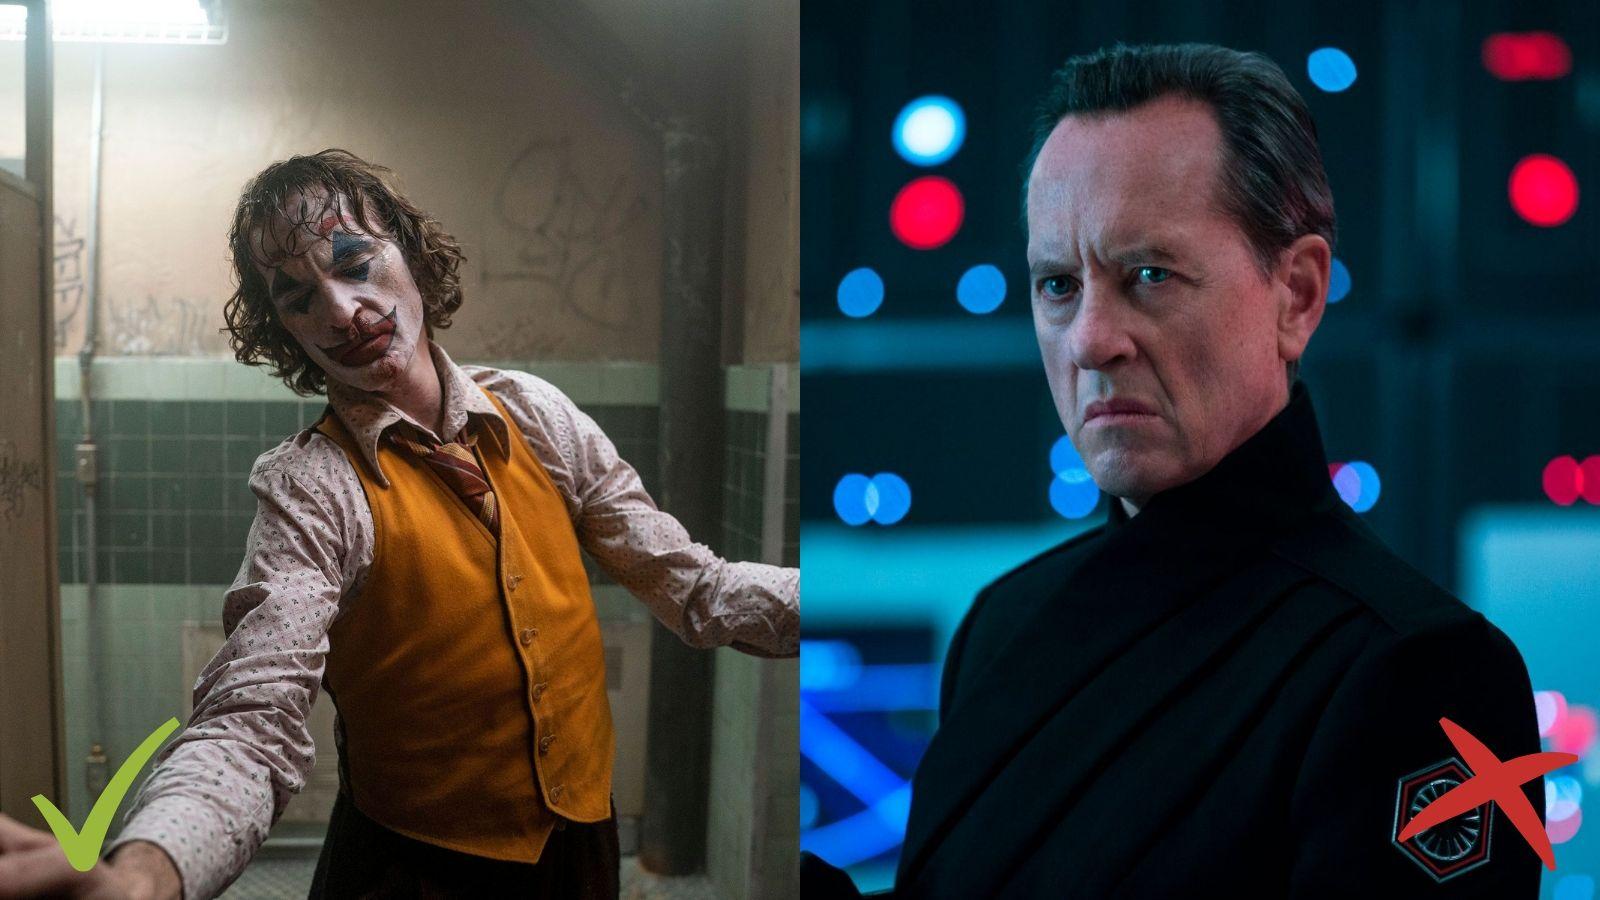 Joker, Star Wars: The Rise of Skywalker, Džokers, Zvaigžņu kari: Skaivokera atdzimšana